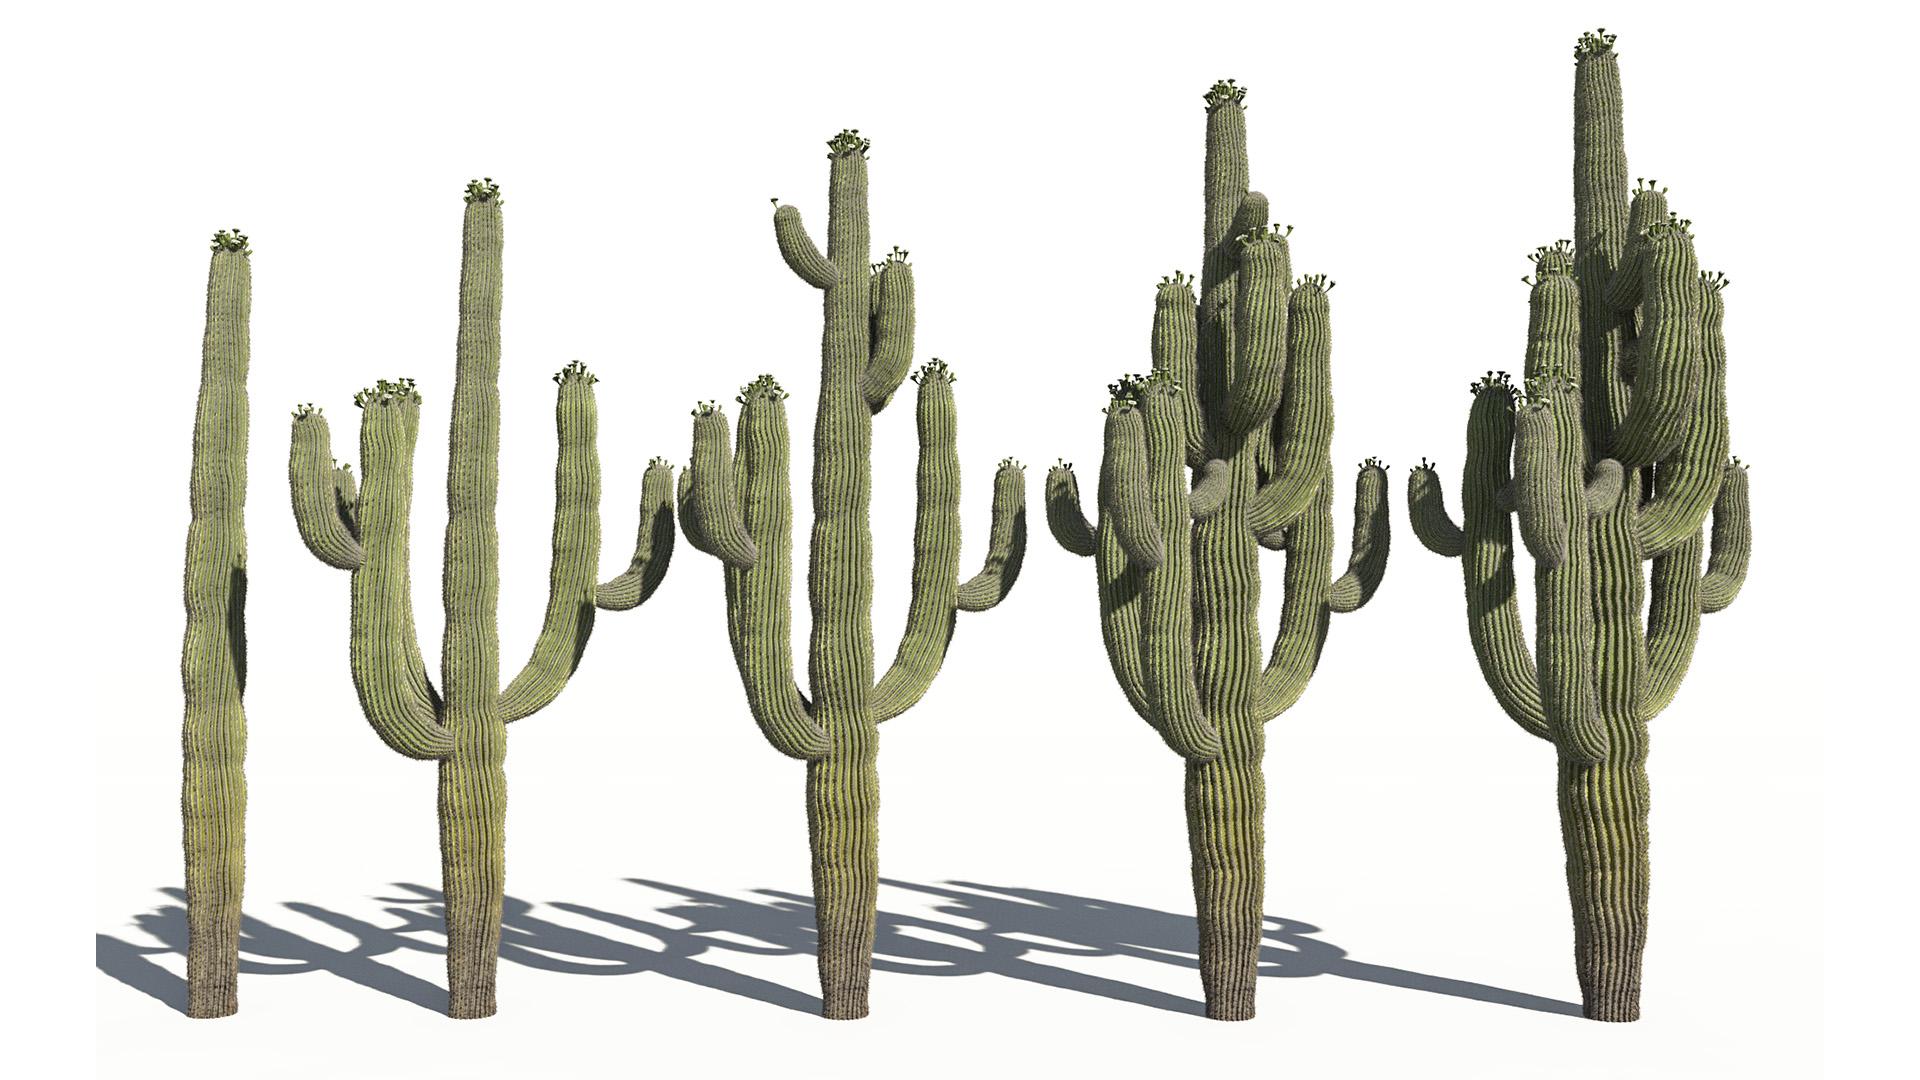 3D model of the Saguaro cactus Carnegiea gigantea different presets